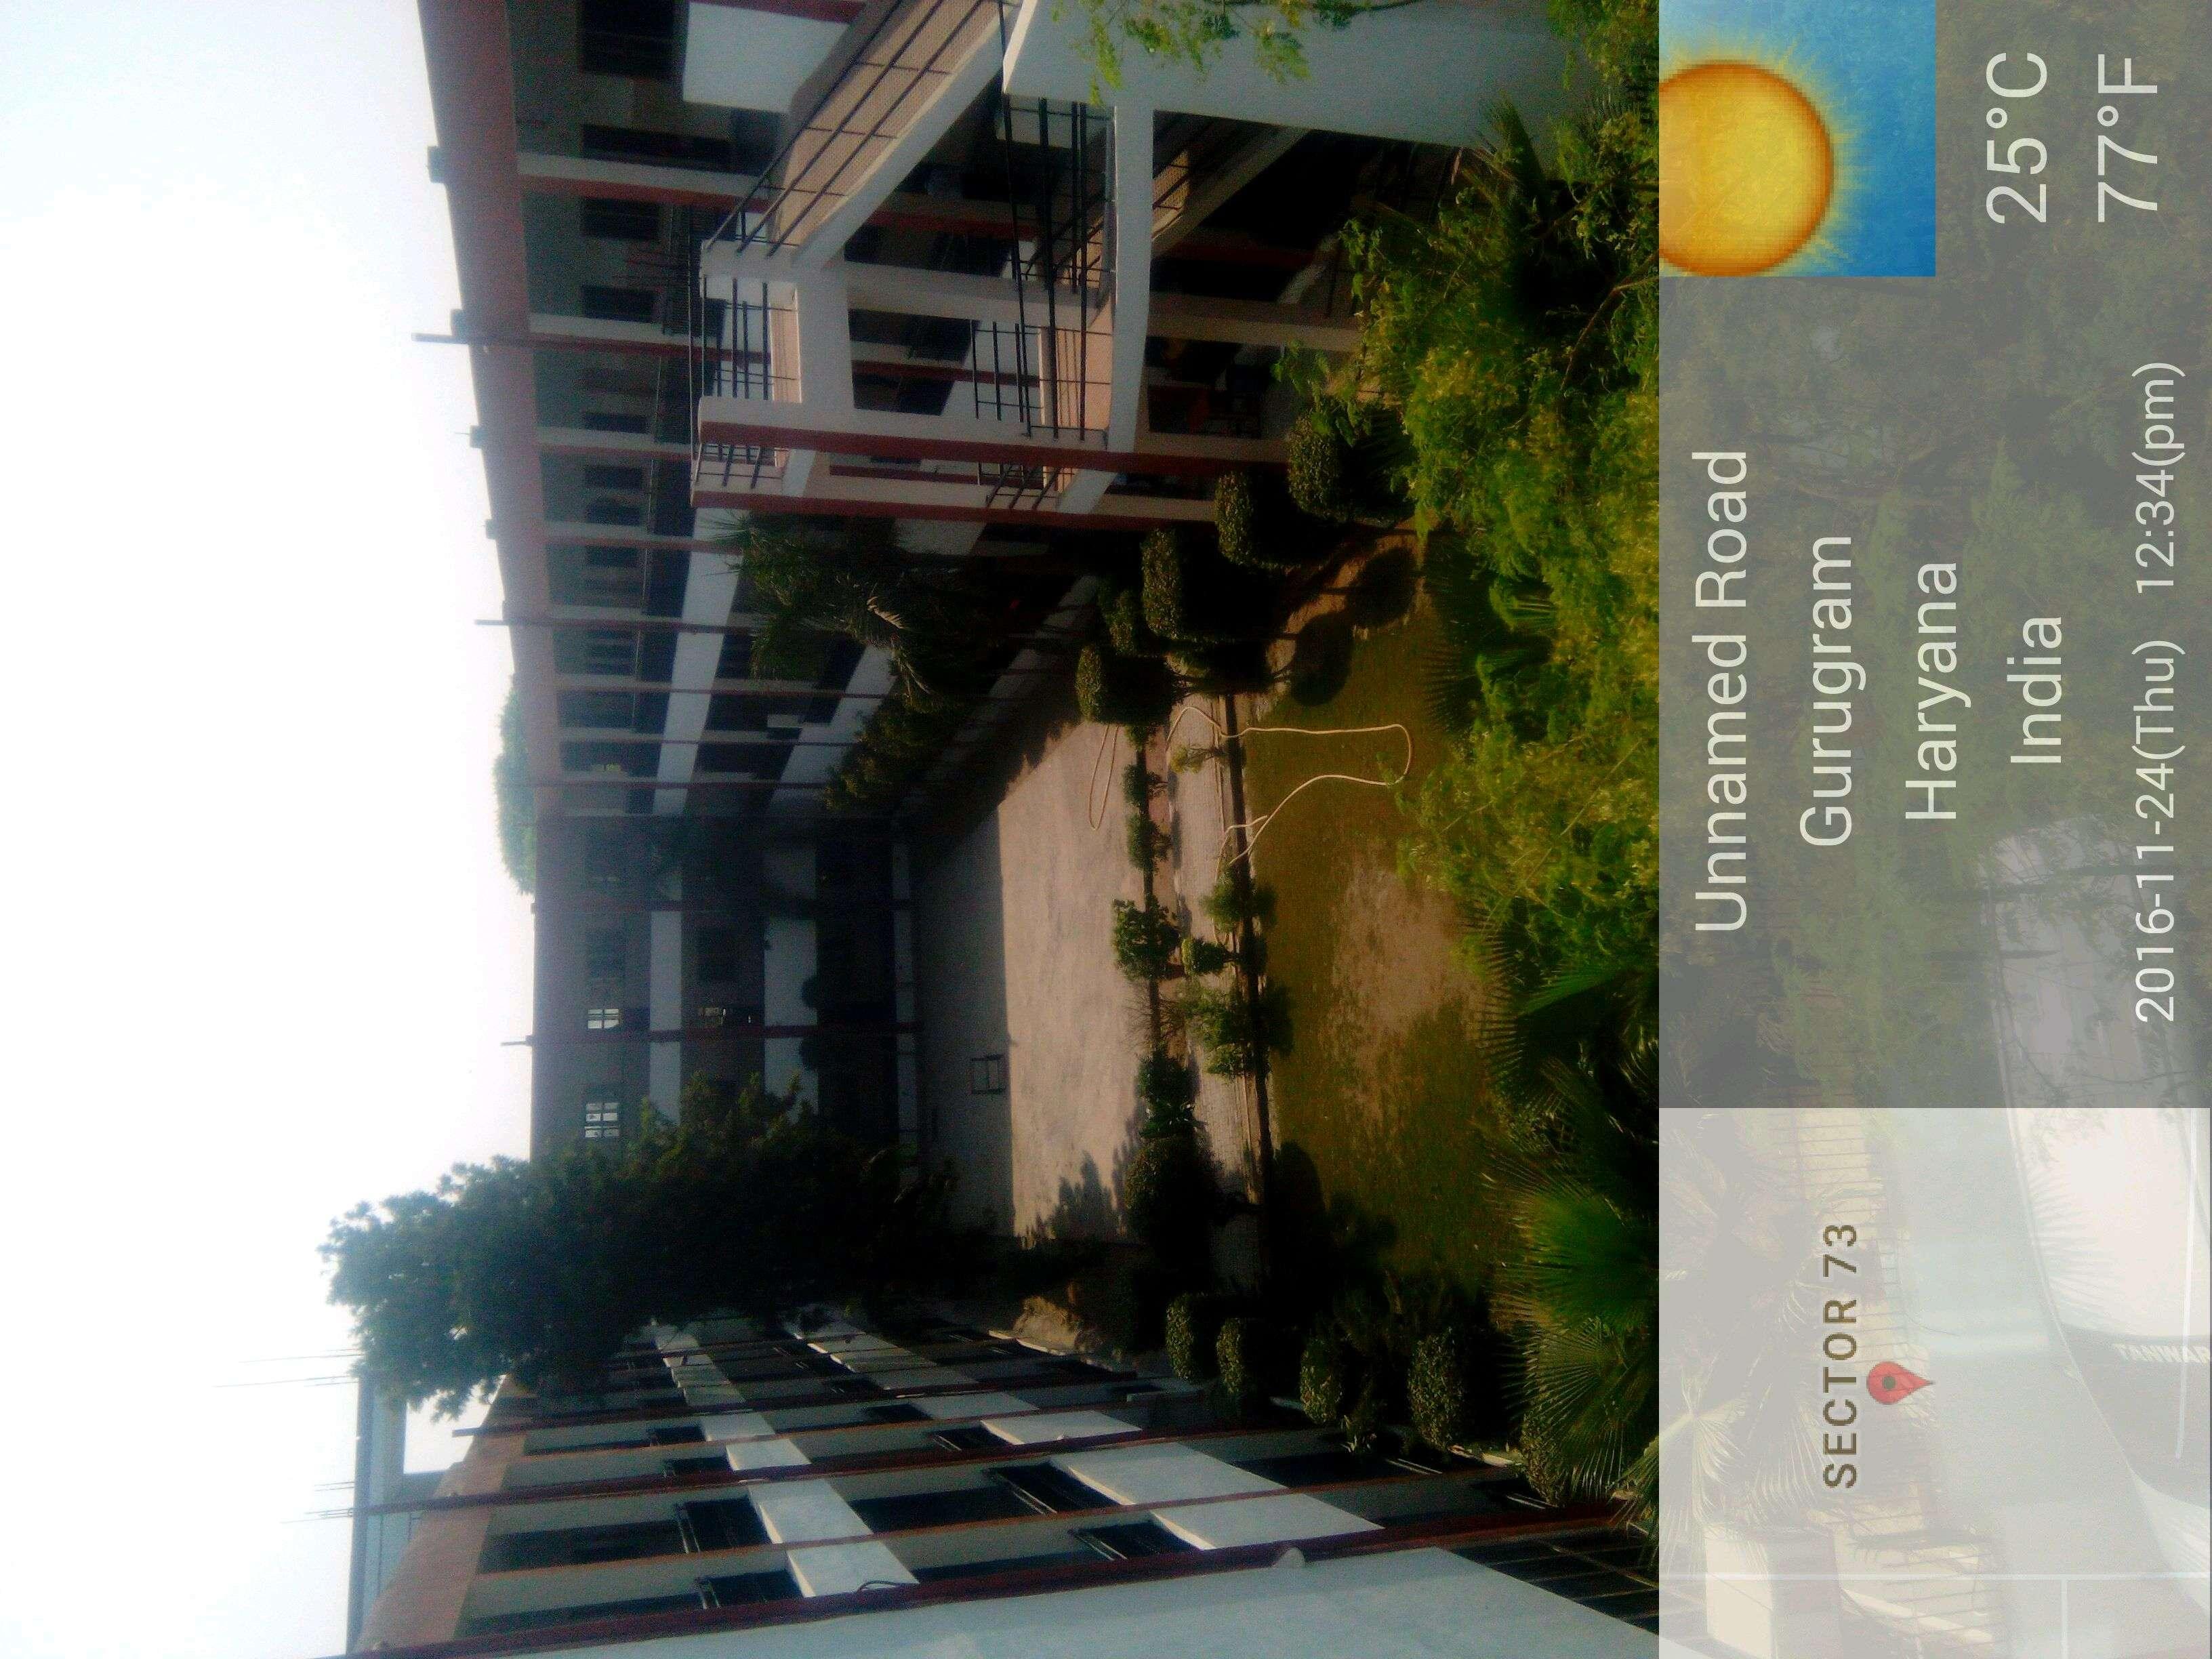 LADY FLORENCE PUBLIC SCHOOL VILL BEGUM PUR KHOTOLA NH 8 KHANDSA GURGAON HARYANA 530570